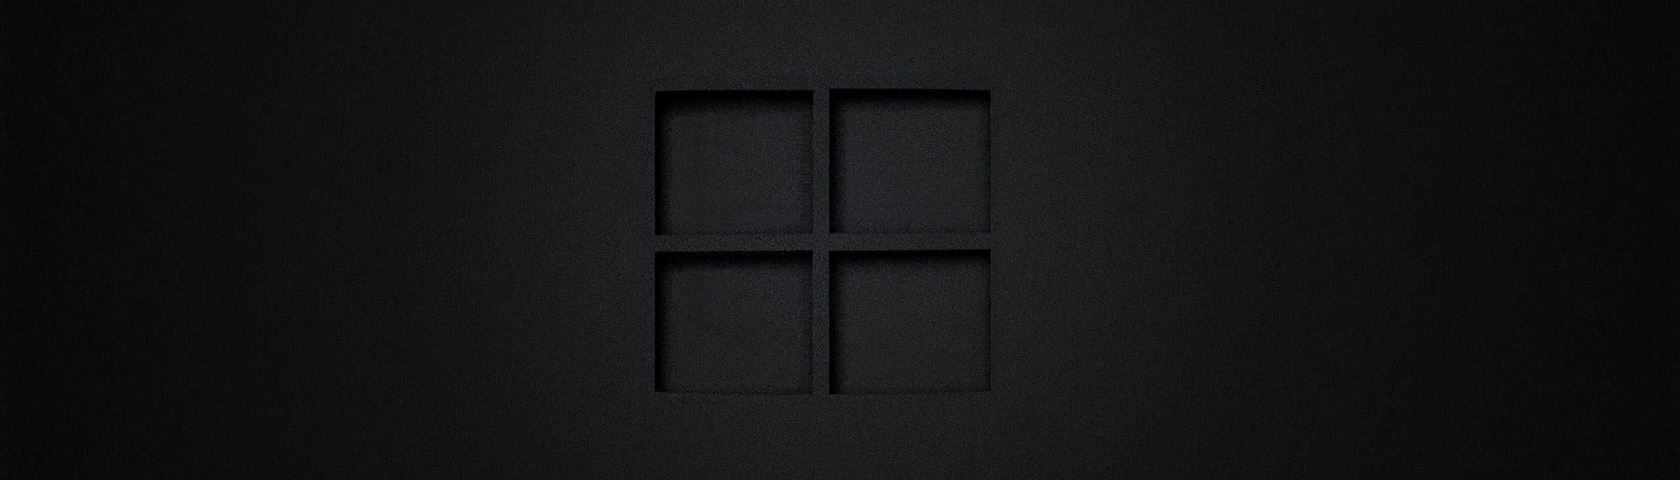 Windows 11 Leather Bound